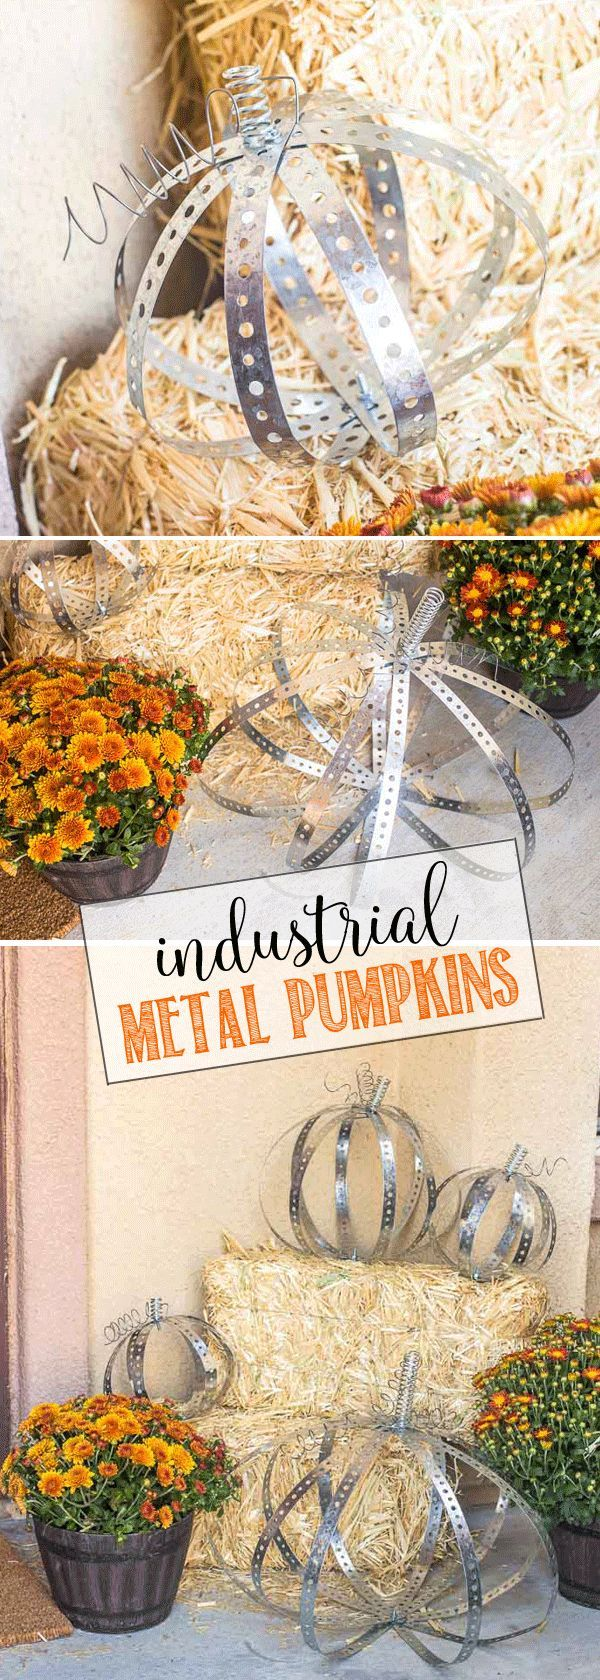 Cutest DIY Industrial Metal Pumpkins perfect for